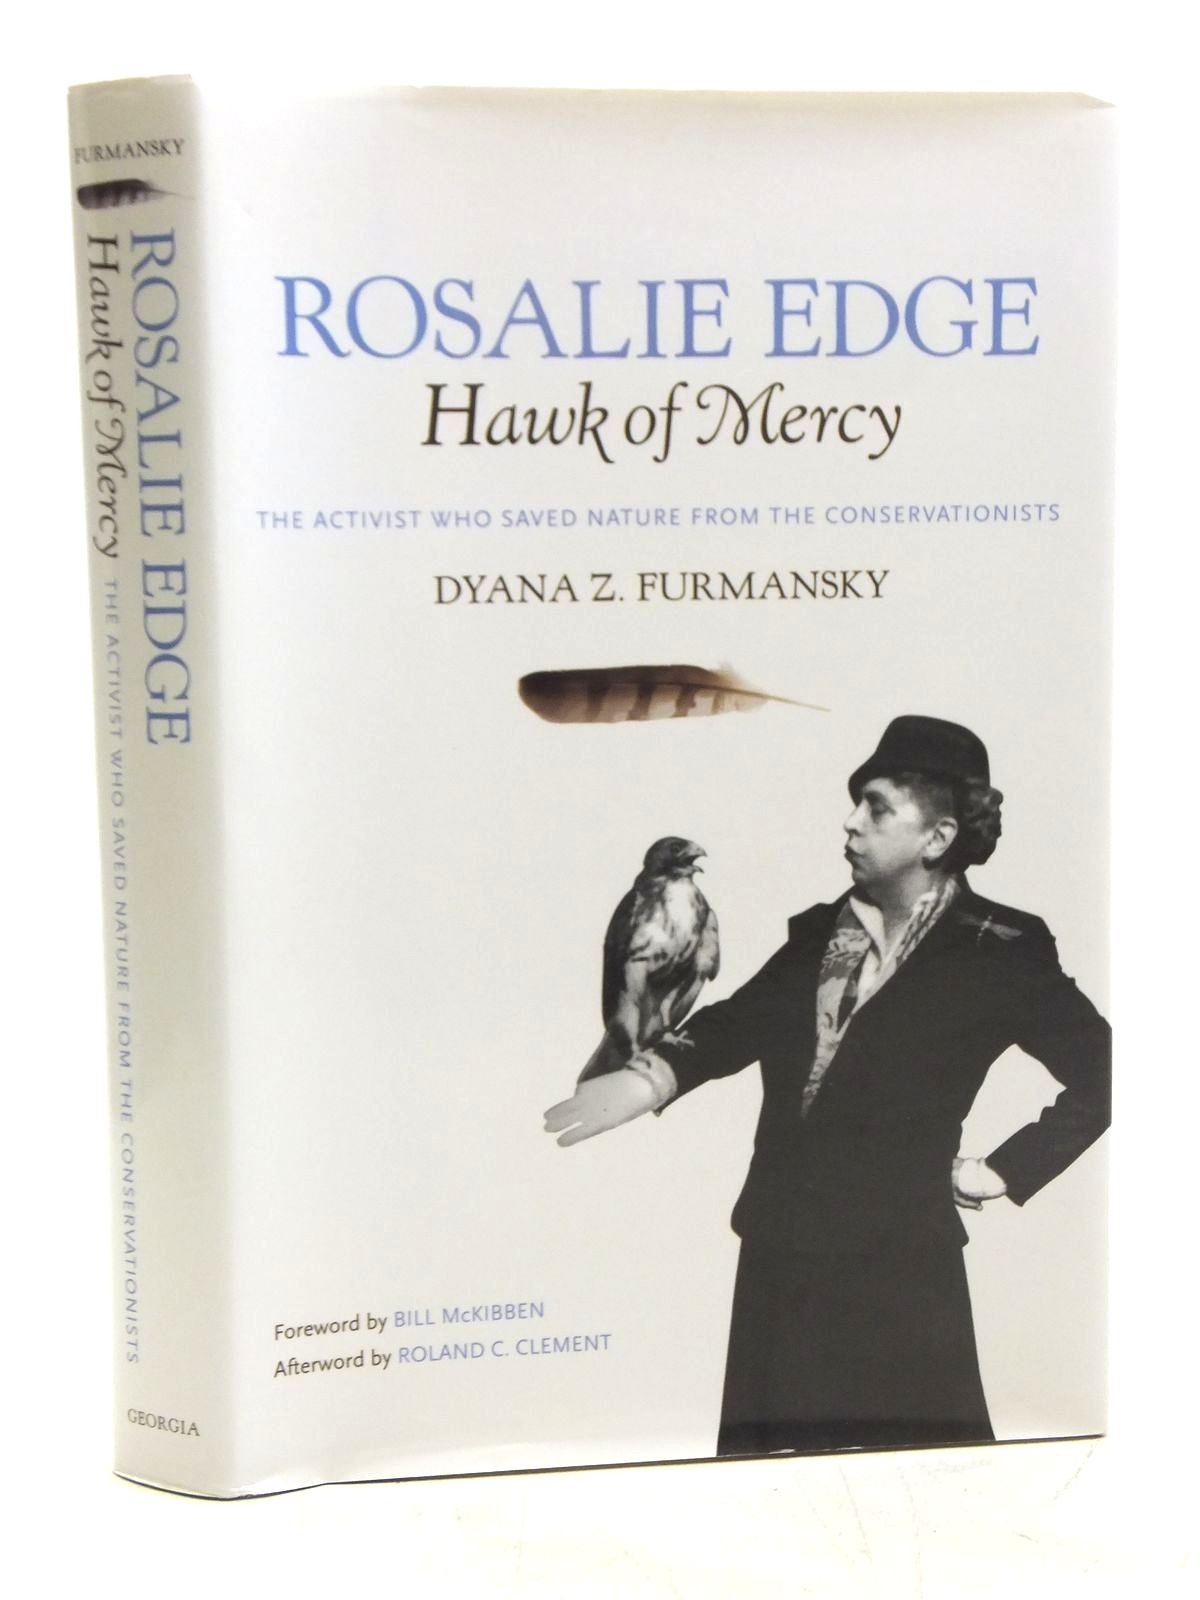 Photo of ROSALIE EDGE, HAWK OF MERCY written by Furmansky, Dyana Z. published by The University of Georgia Press (STOCK CODE: 1607688)  for sale by Stella & Rose's Books